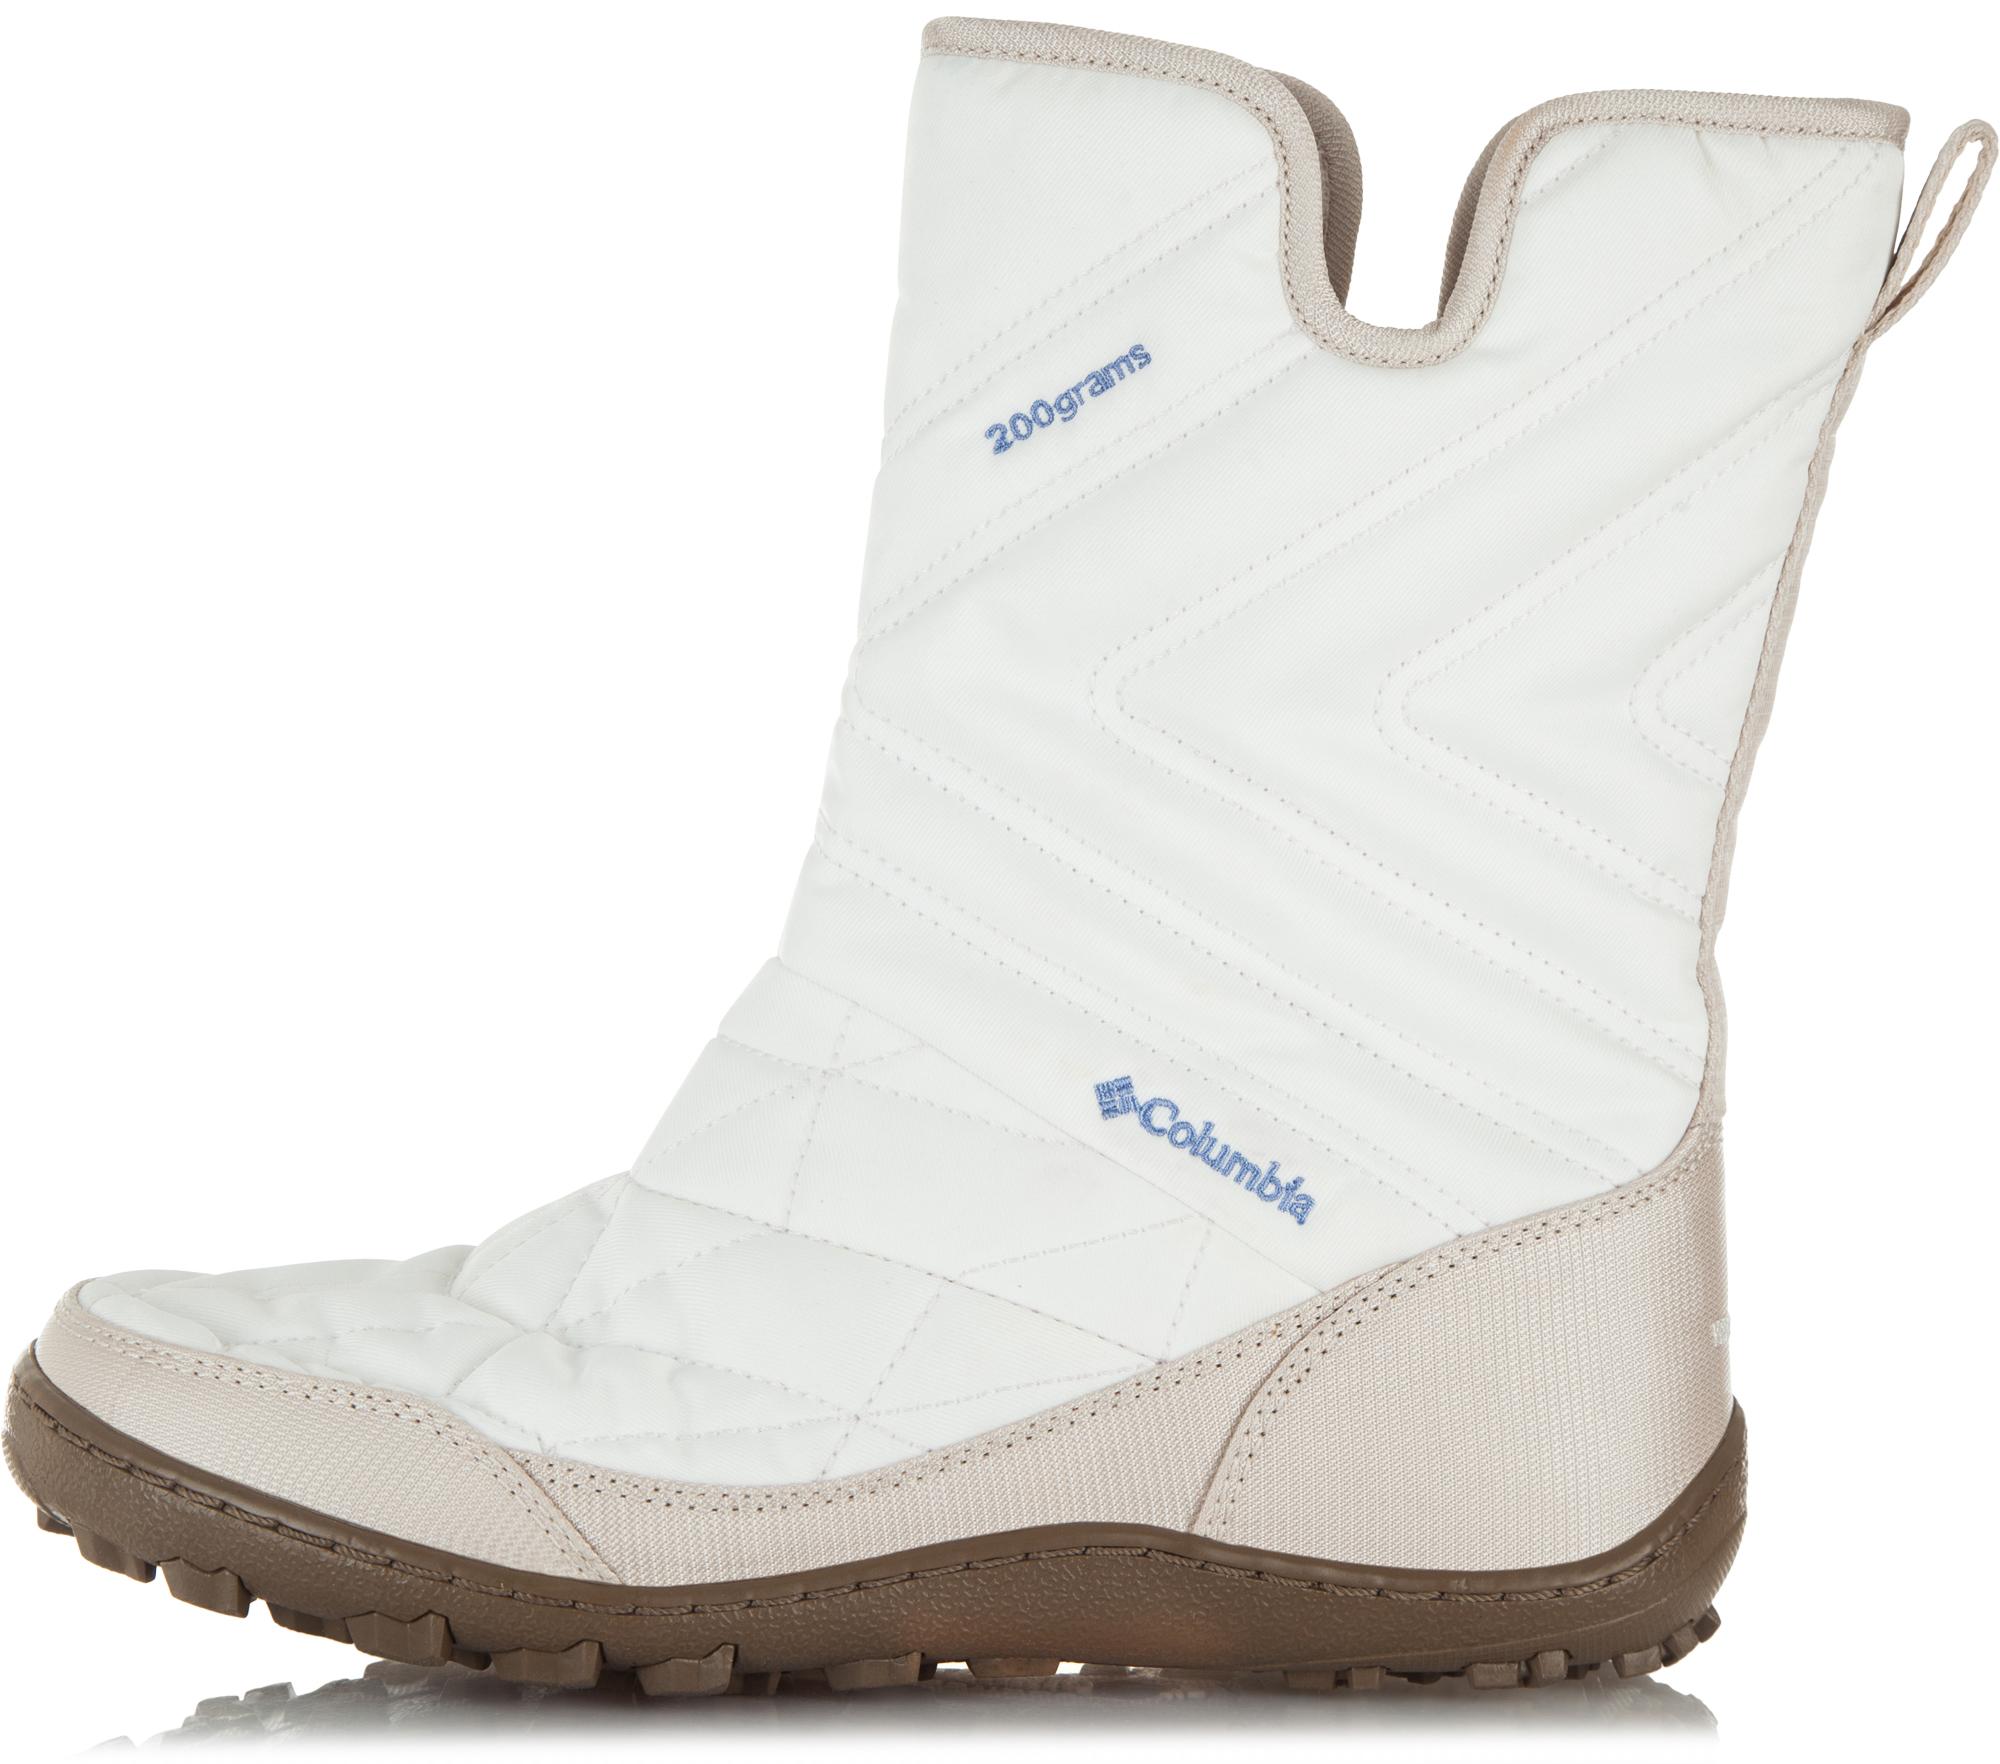 Columbia Сапоги утепленные женские Columbia Minx Slip III, размер 41 цены онлайн